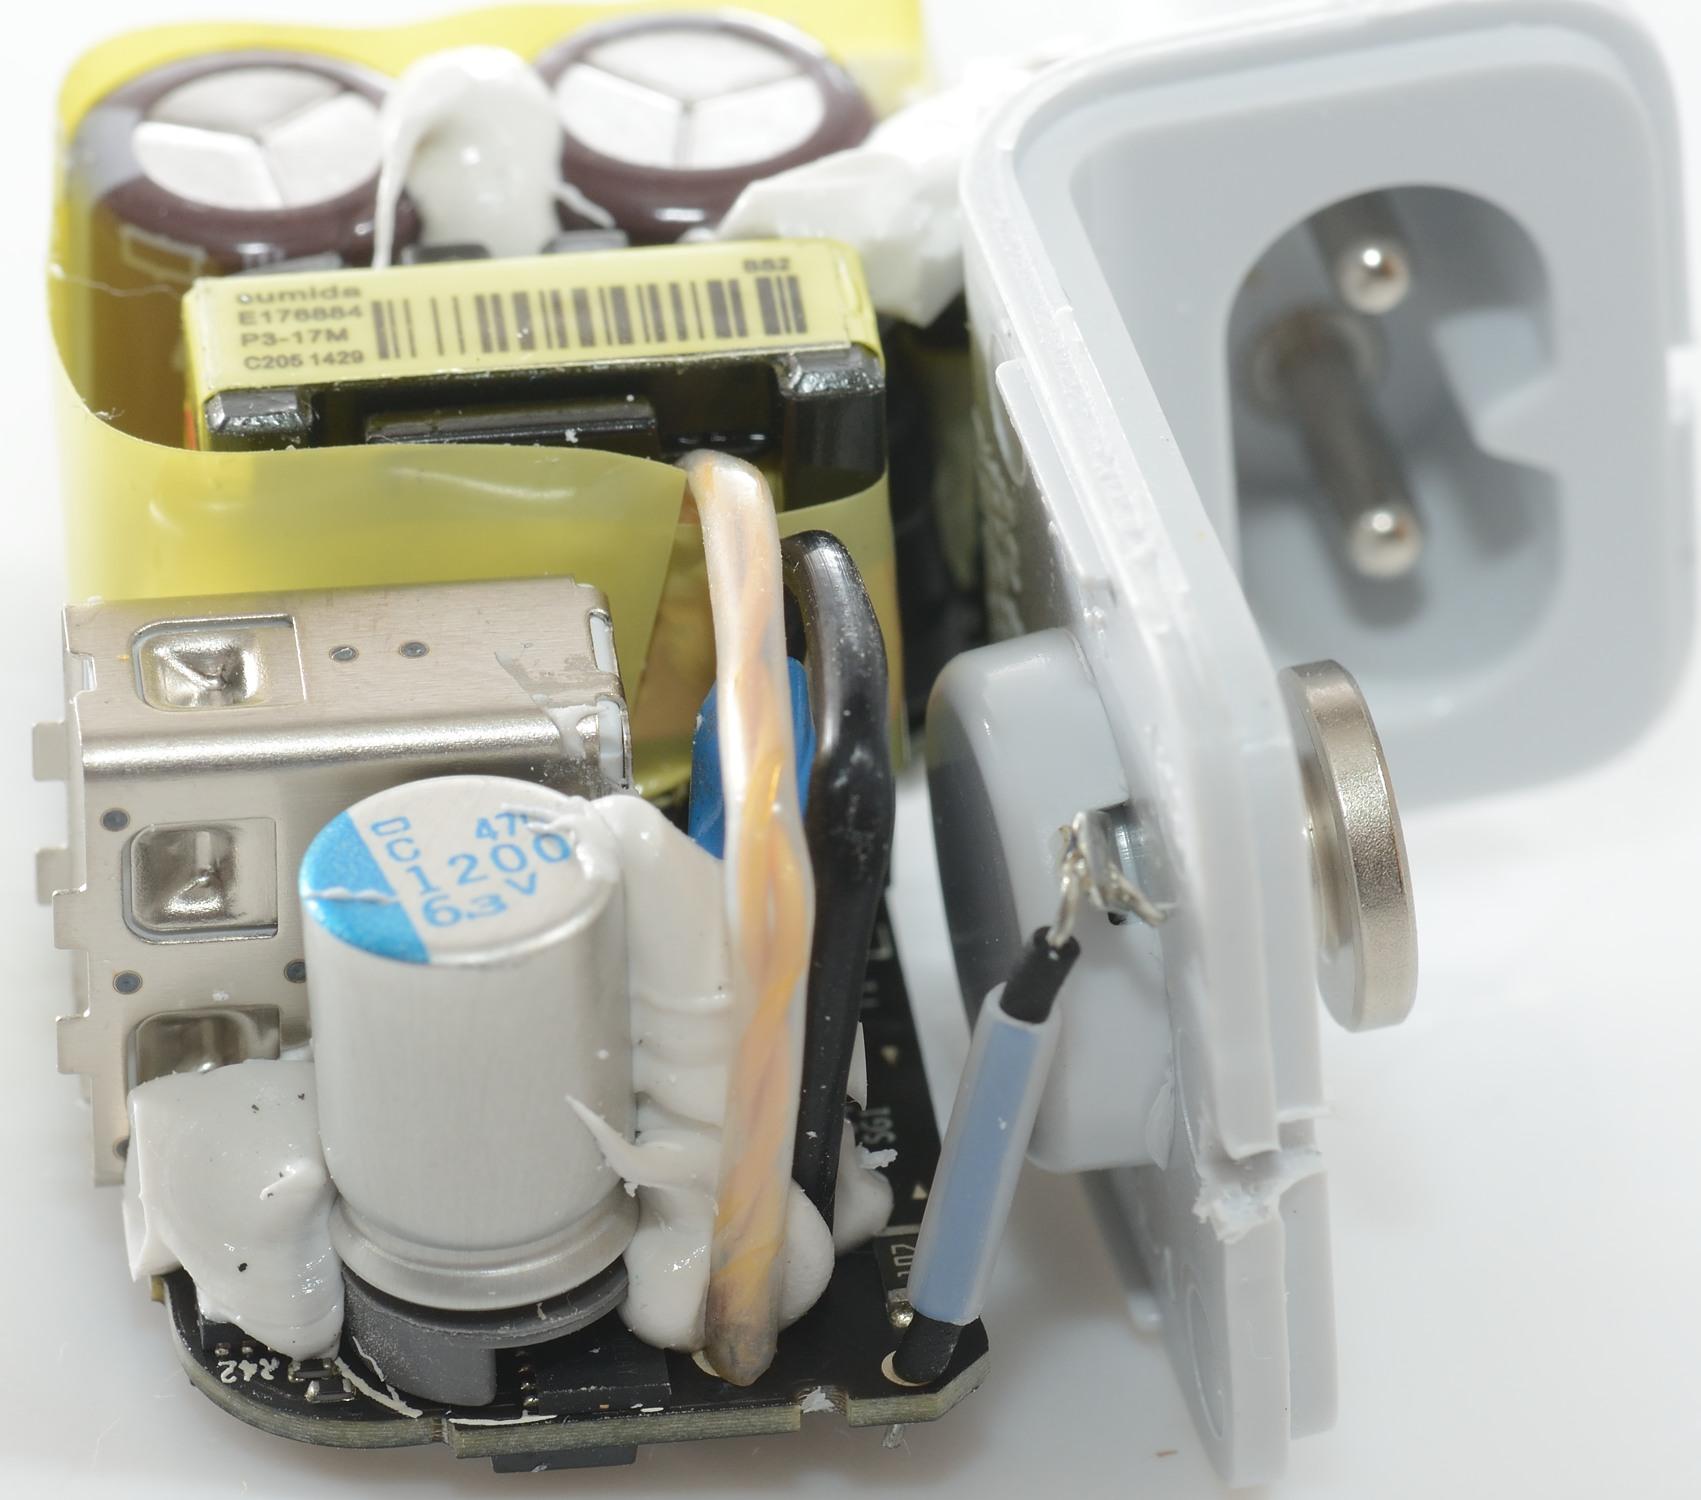 Test of Apple 12W USB power adapter